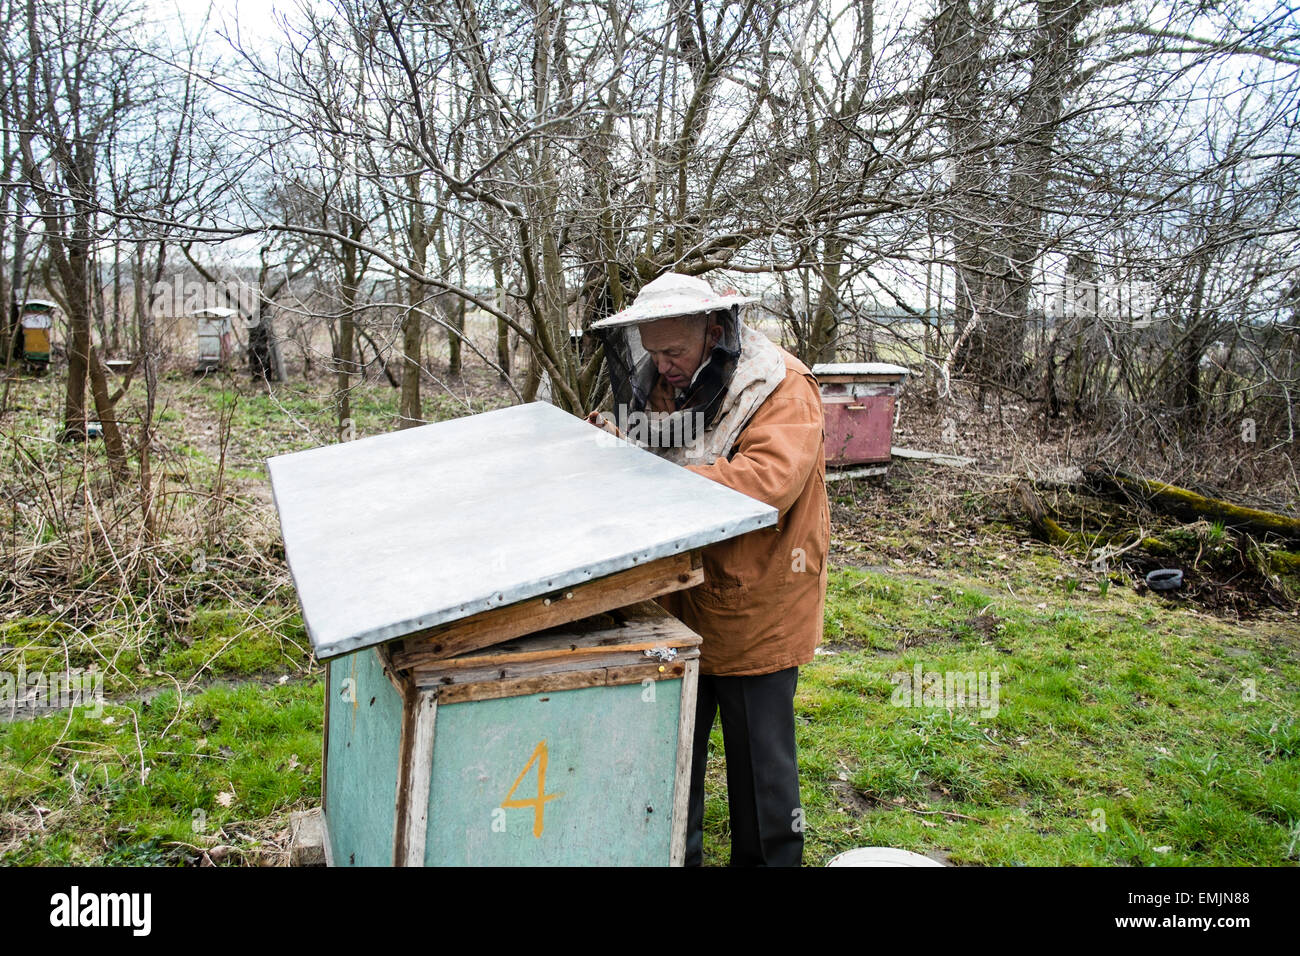 Rural apiary, Osiny, Poland - Stock Image